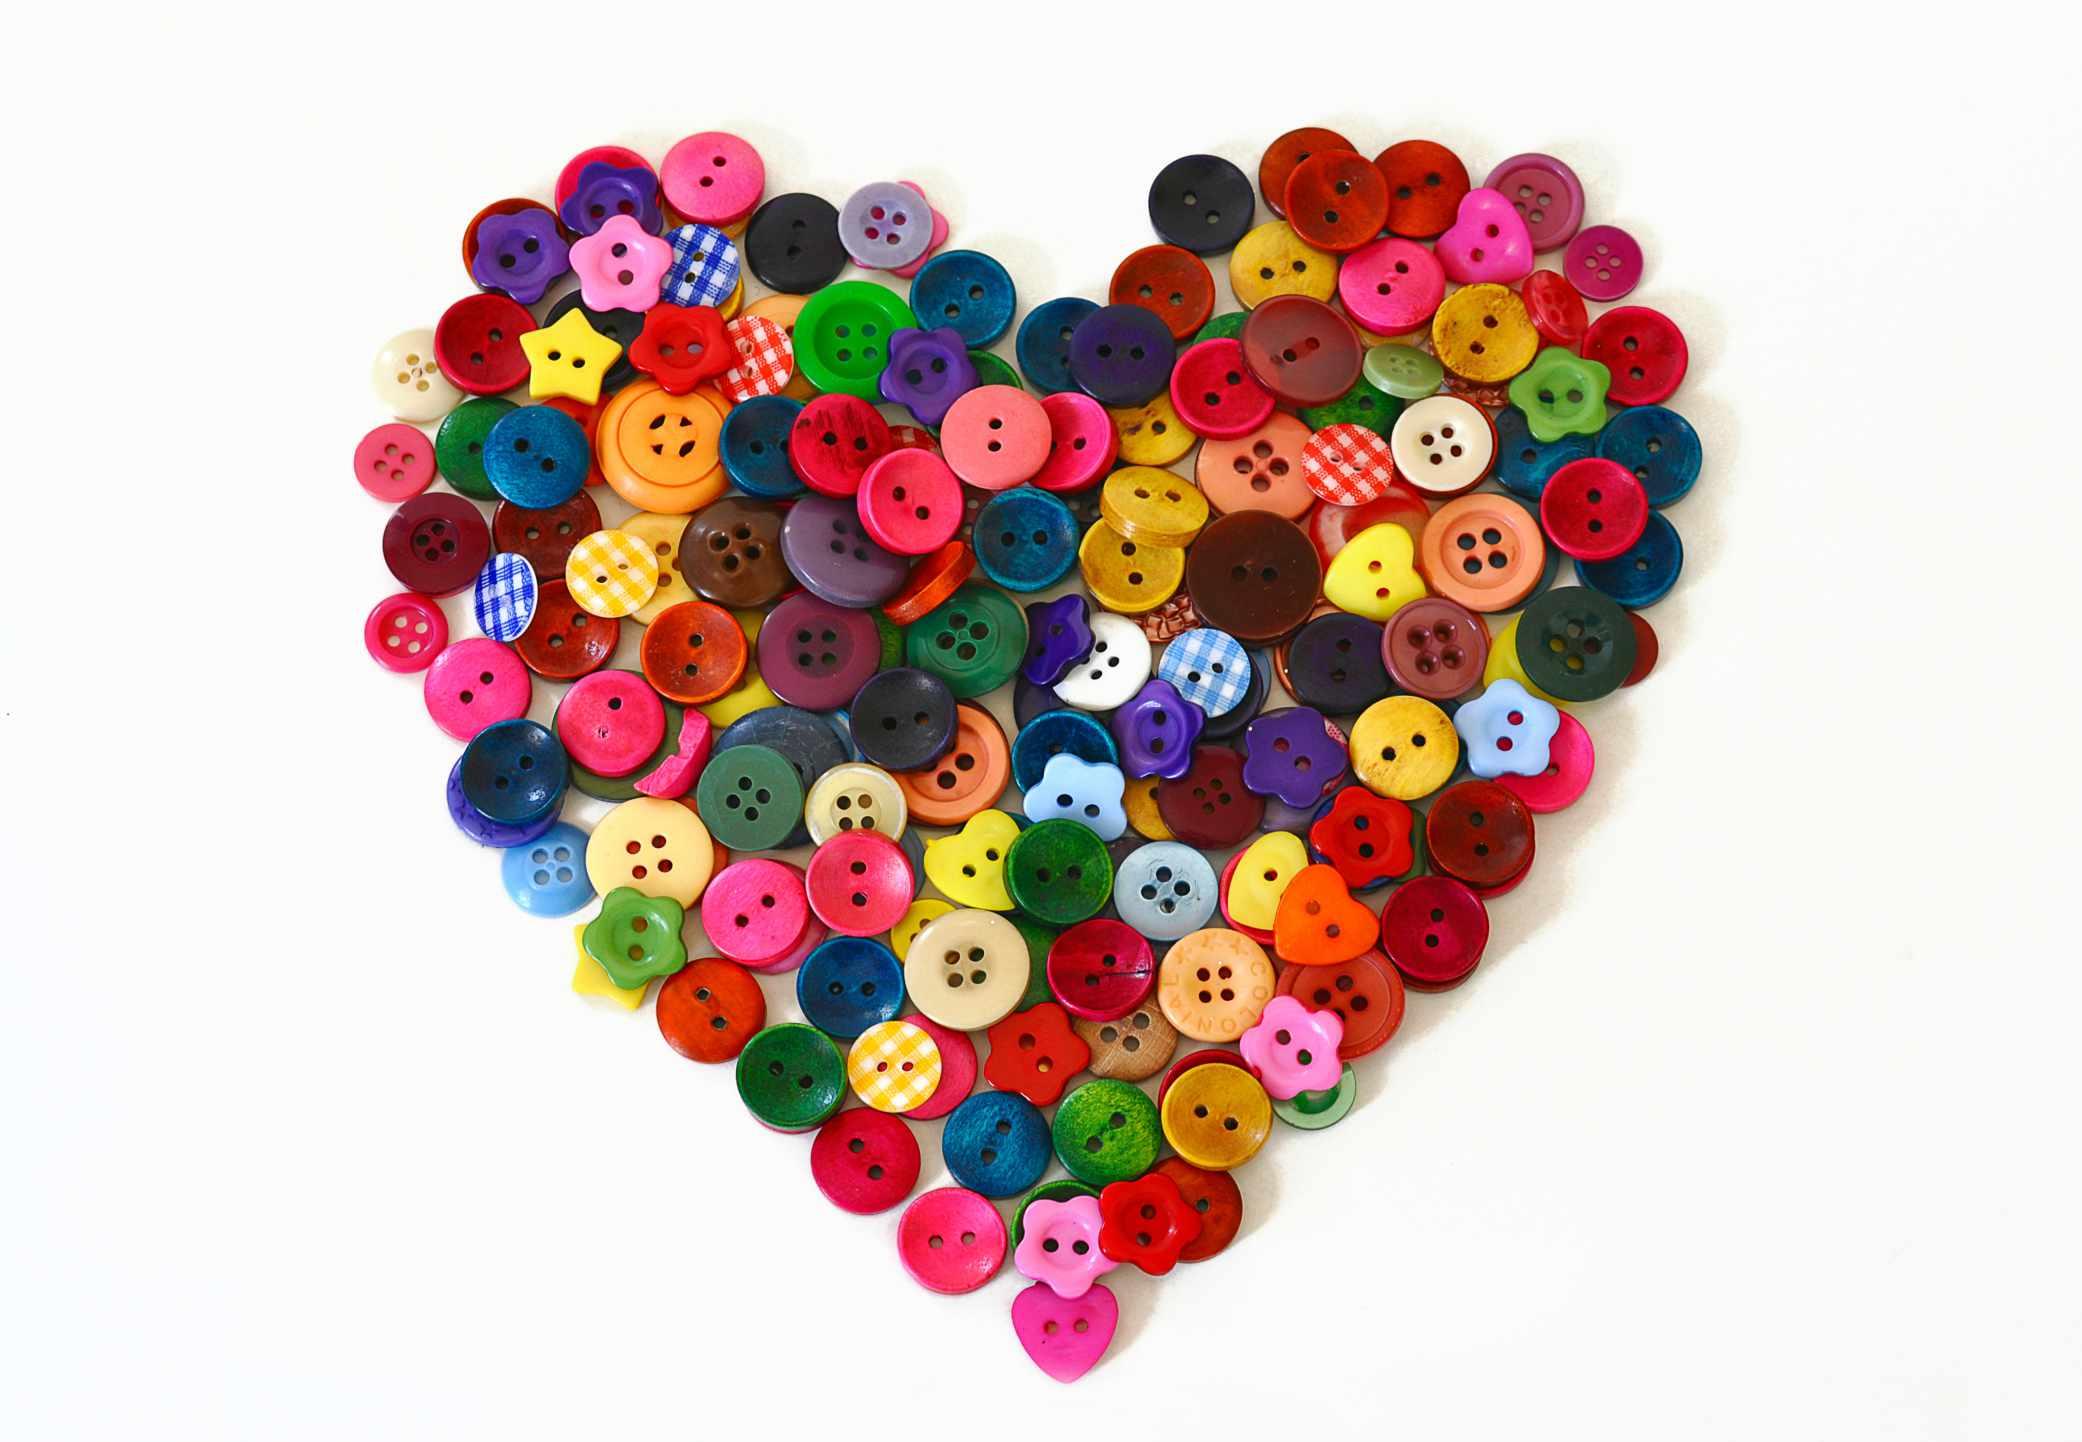 Heart of Buttons